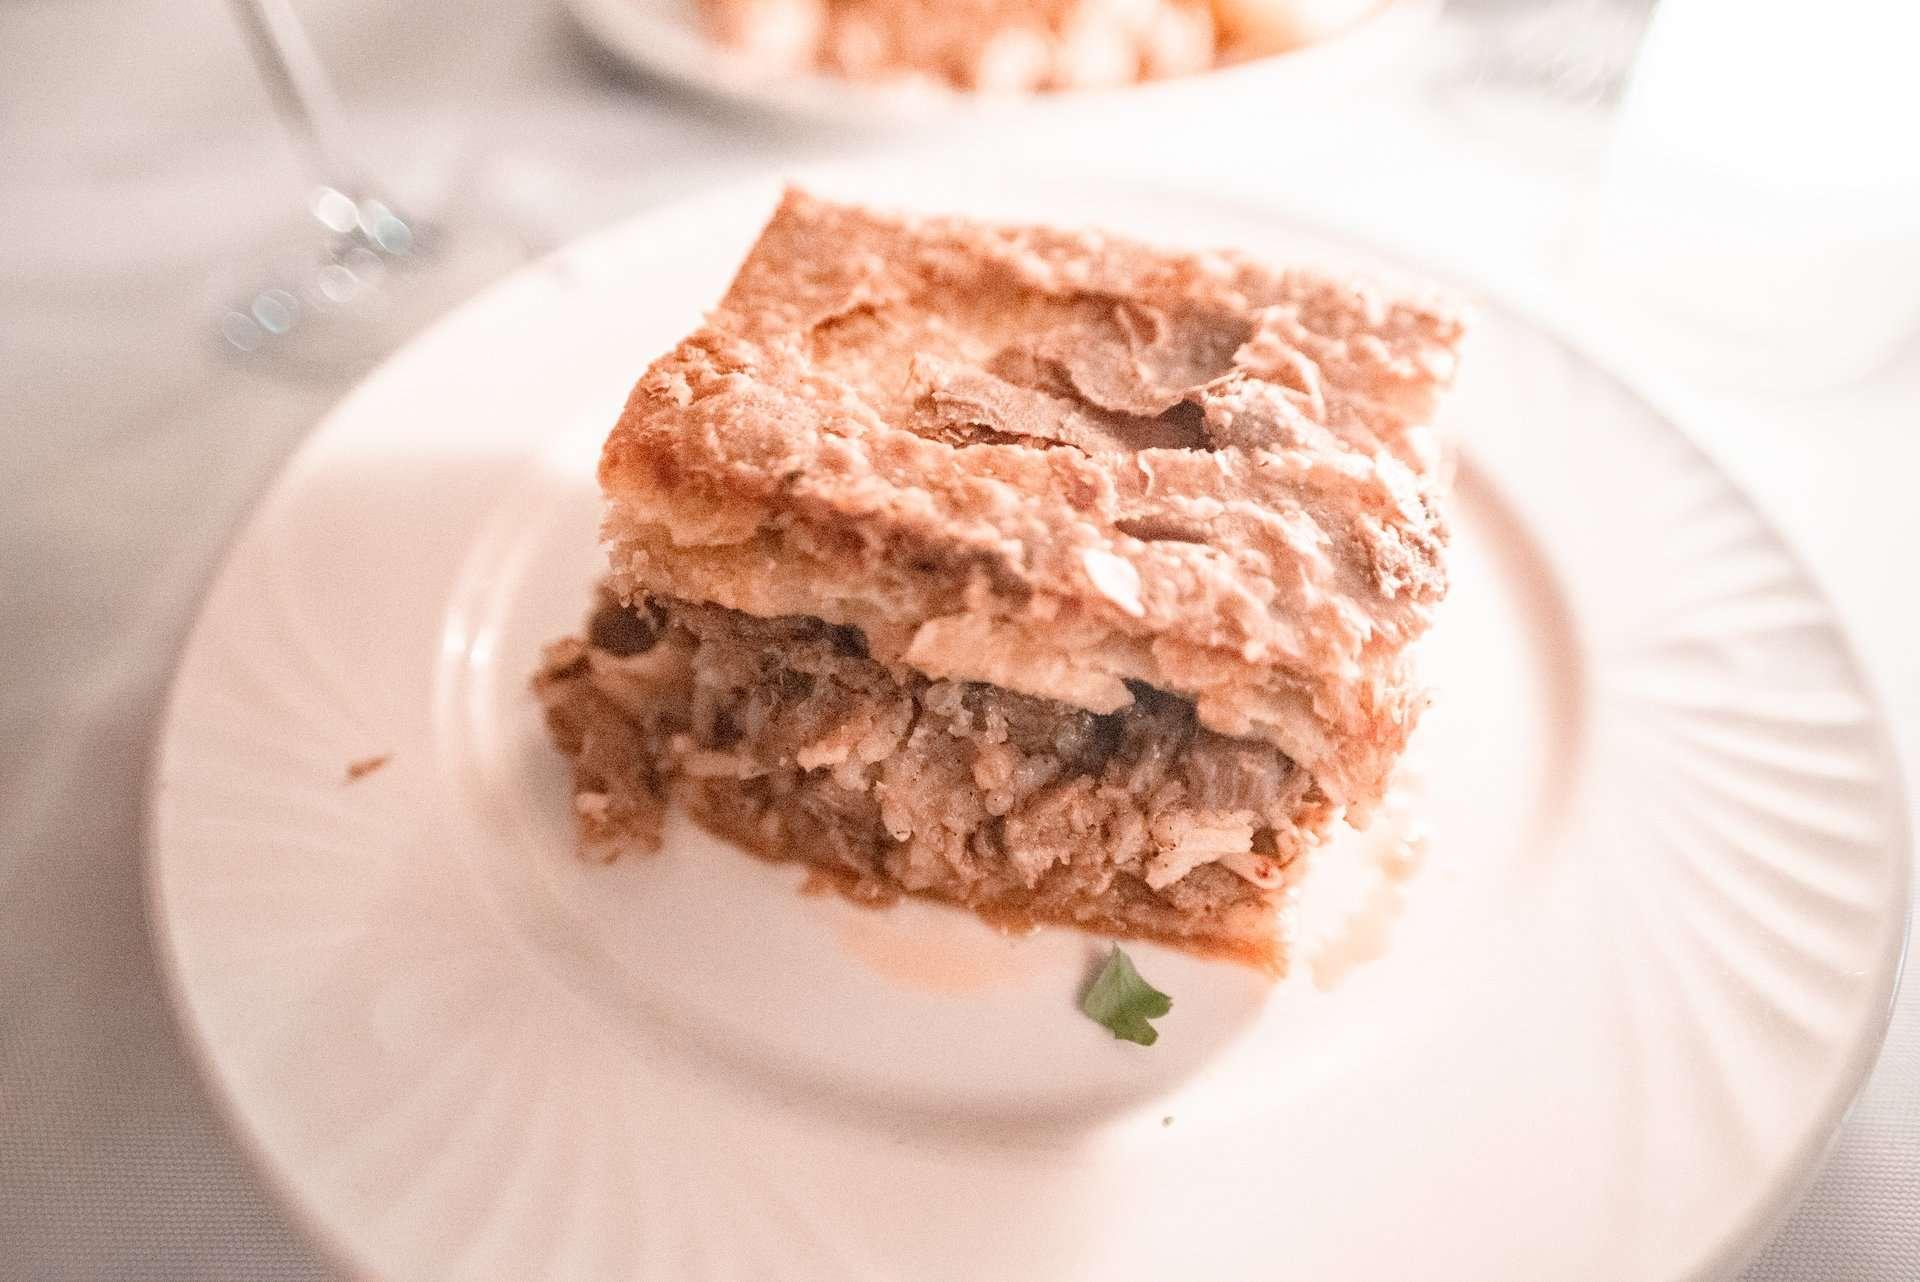 Kefalonian meat pie at Tassia Restaurant